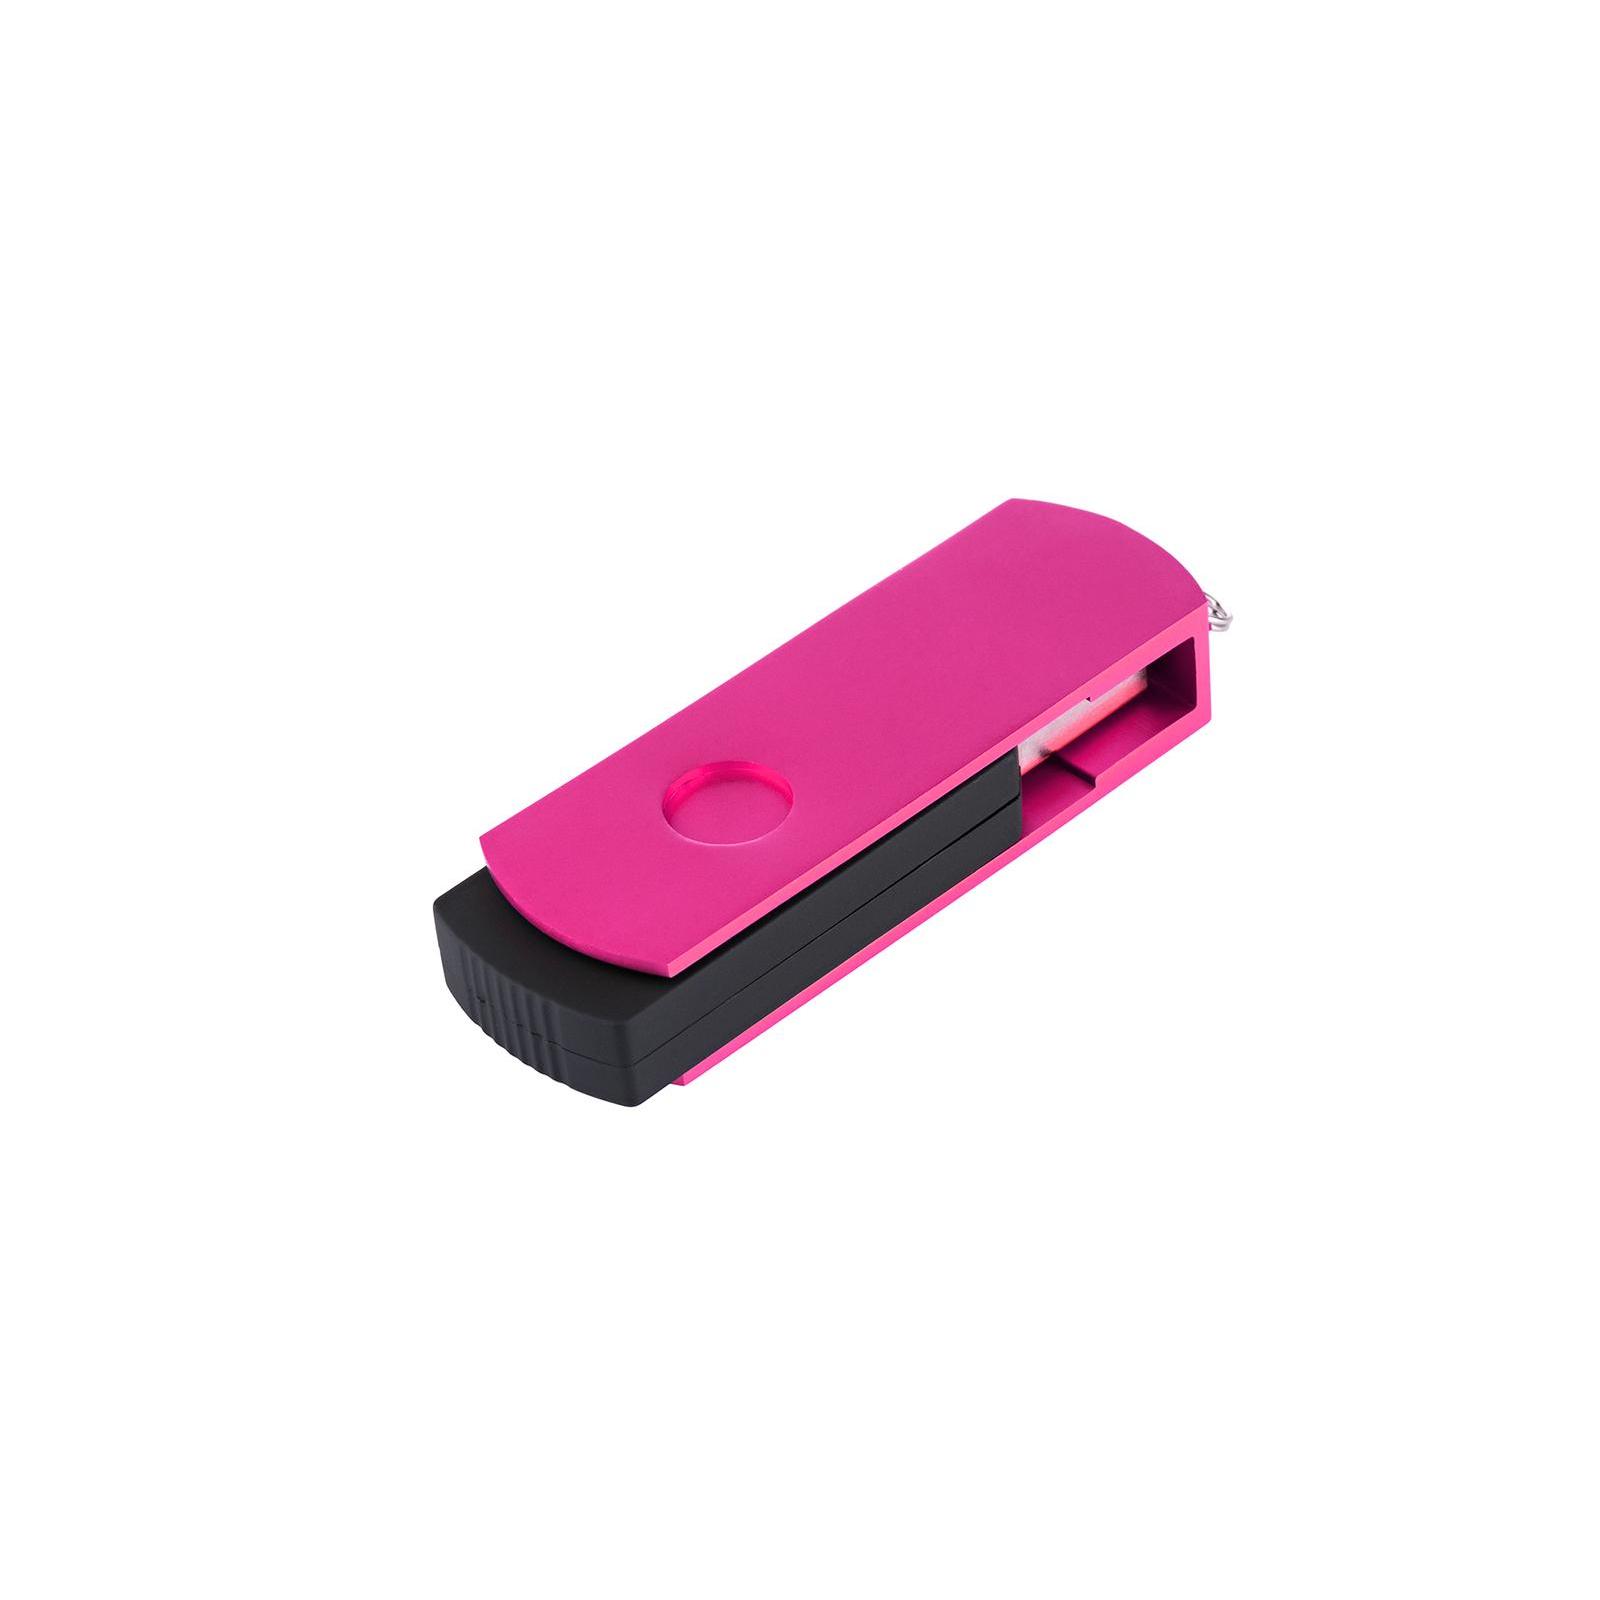 USB флеш накопитель eXceleram 8GB P2 Series Rose/Black USB 2.0 (EXP2U2ROB08) изображение 6